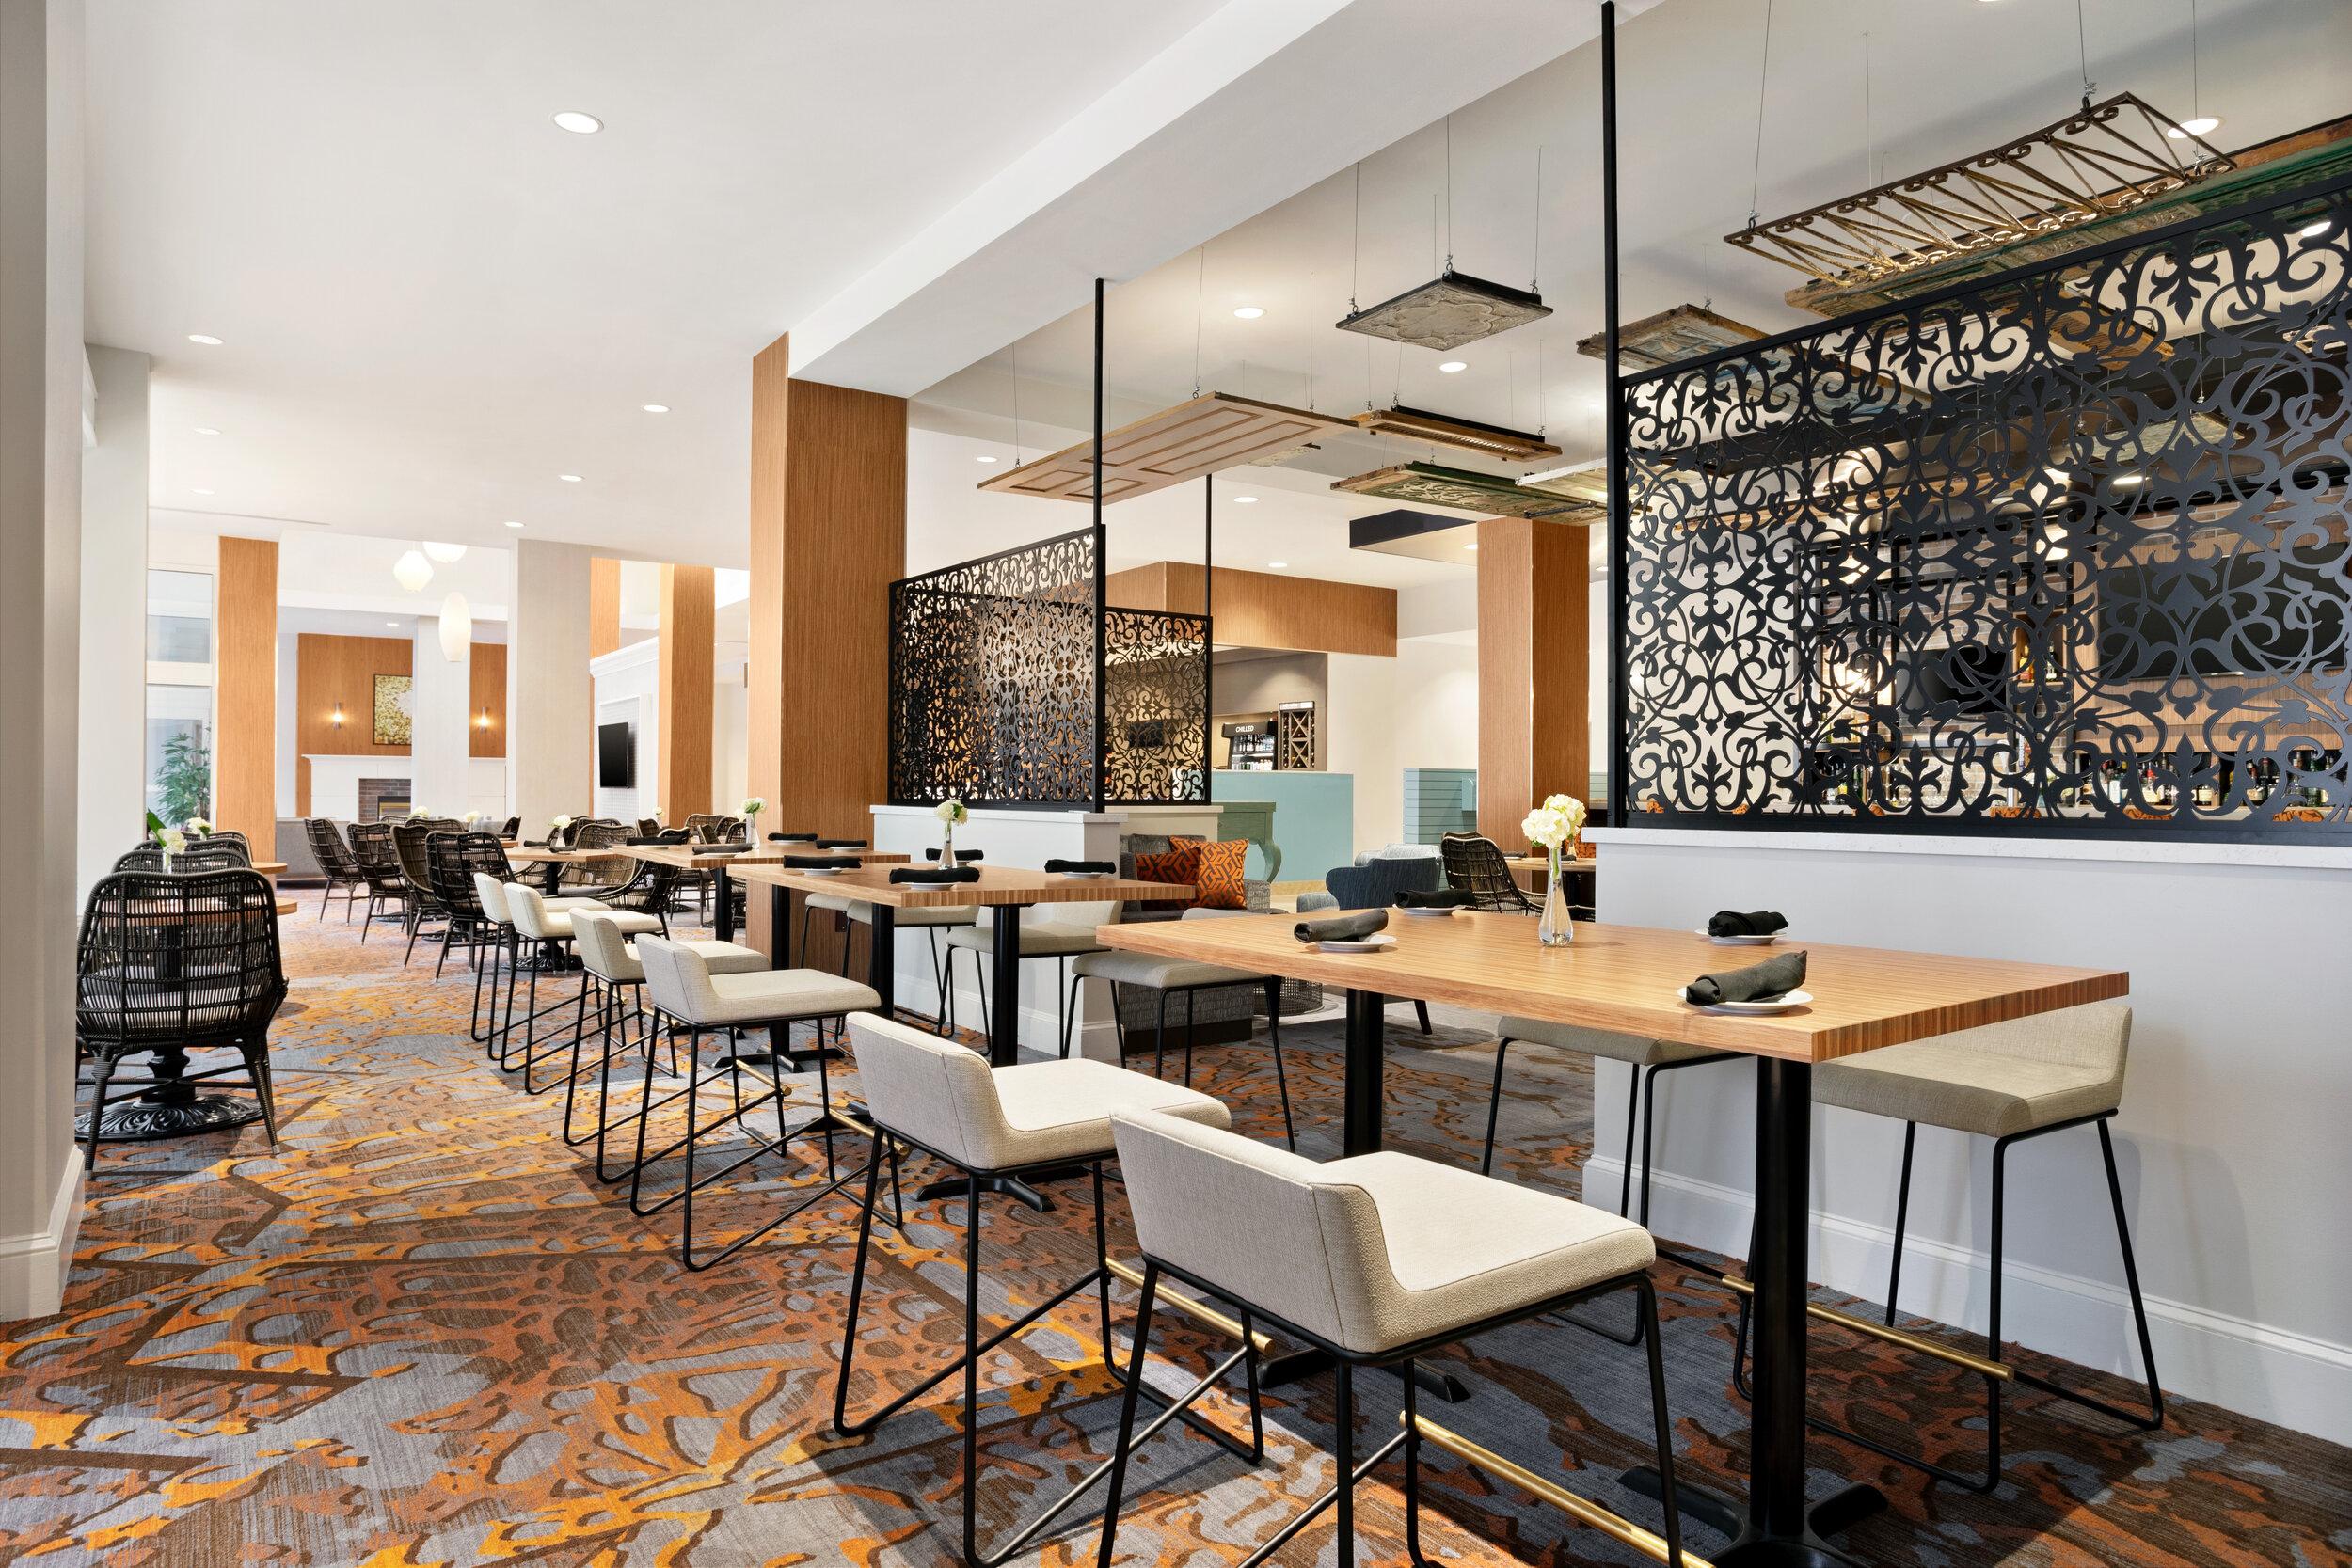 MSYGI_Restaurant_Rest_Seating_02.jpg